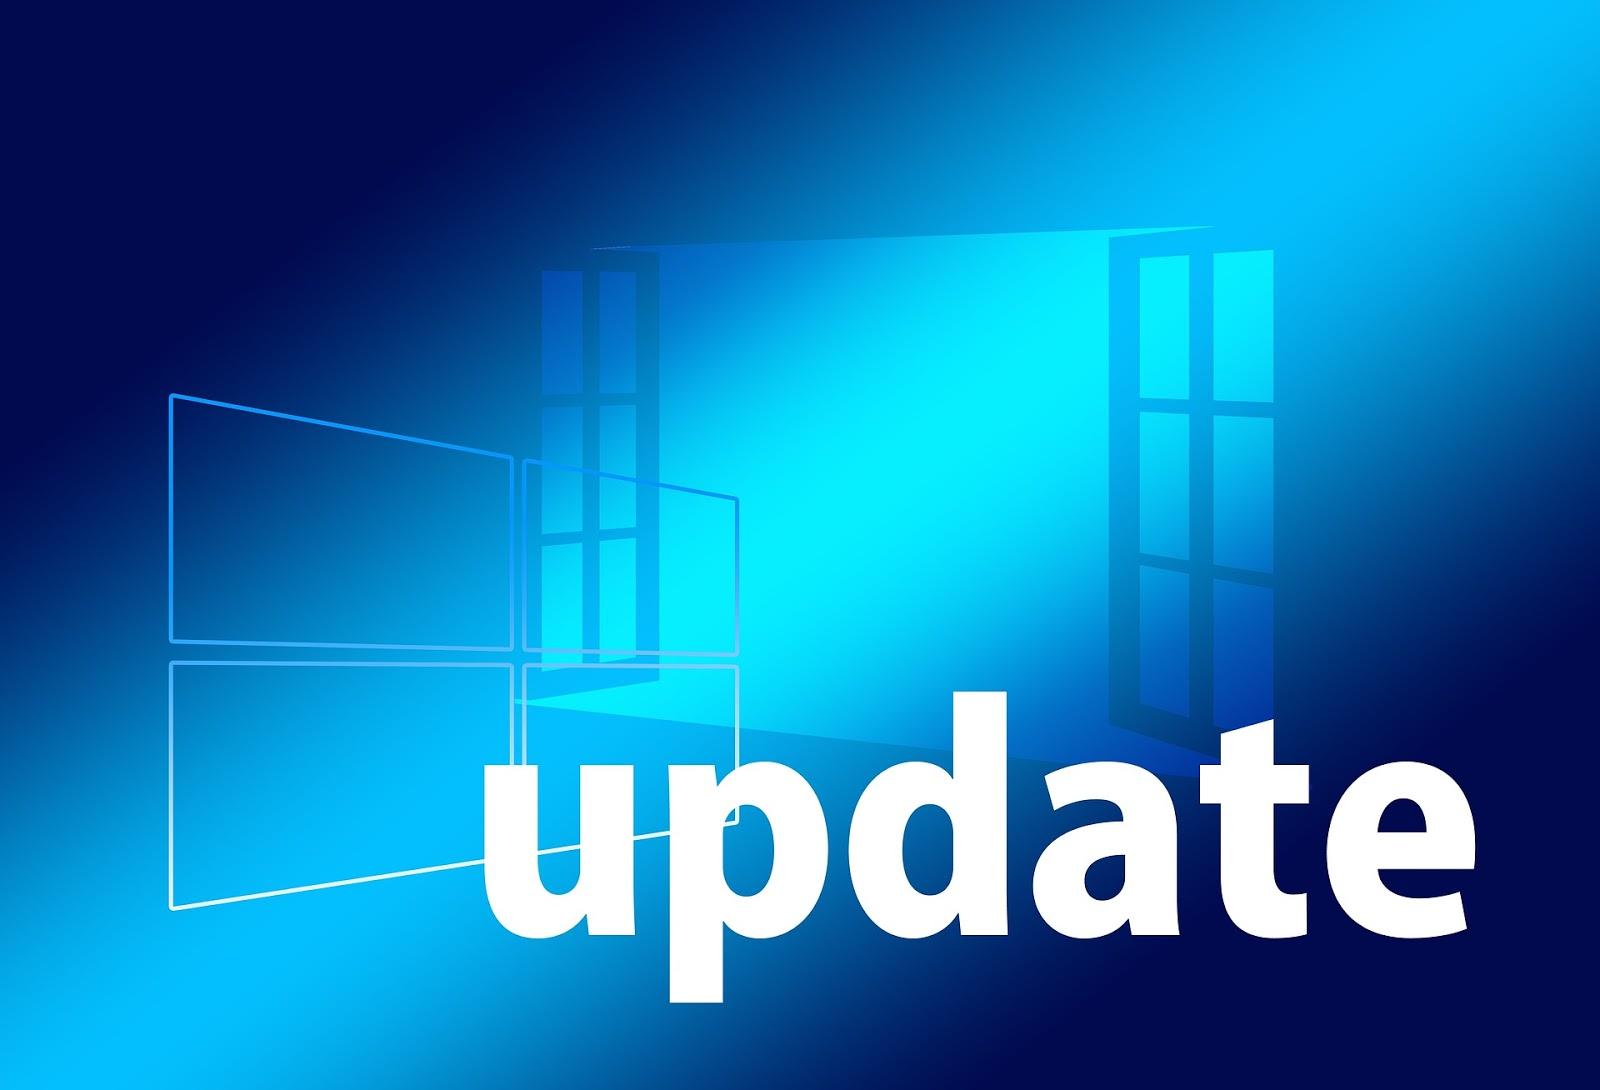 MS-Labrats (Updates via Twitter @MSLabrats): Windows 10 - 1903 whats new